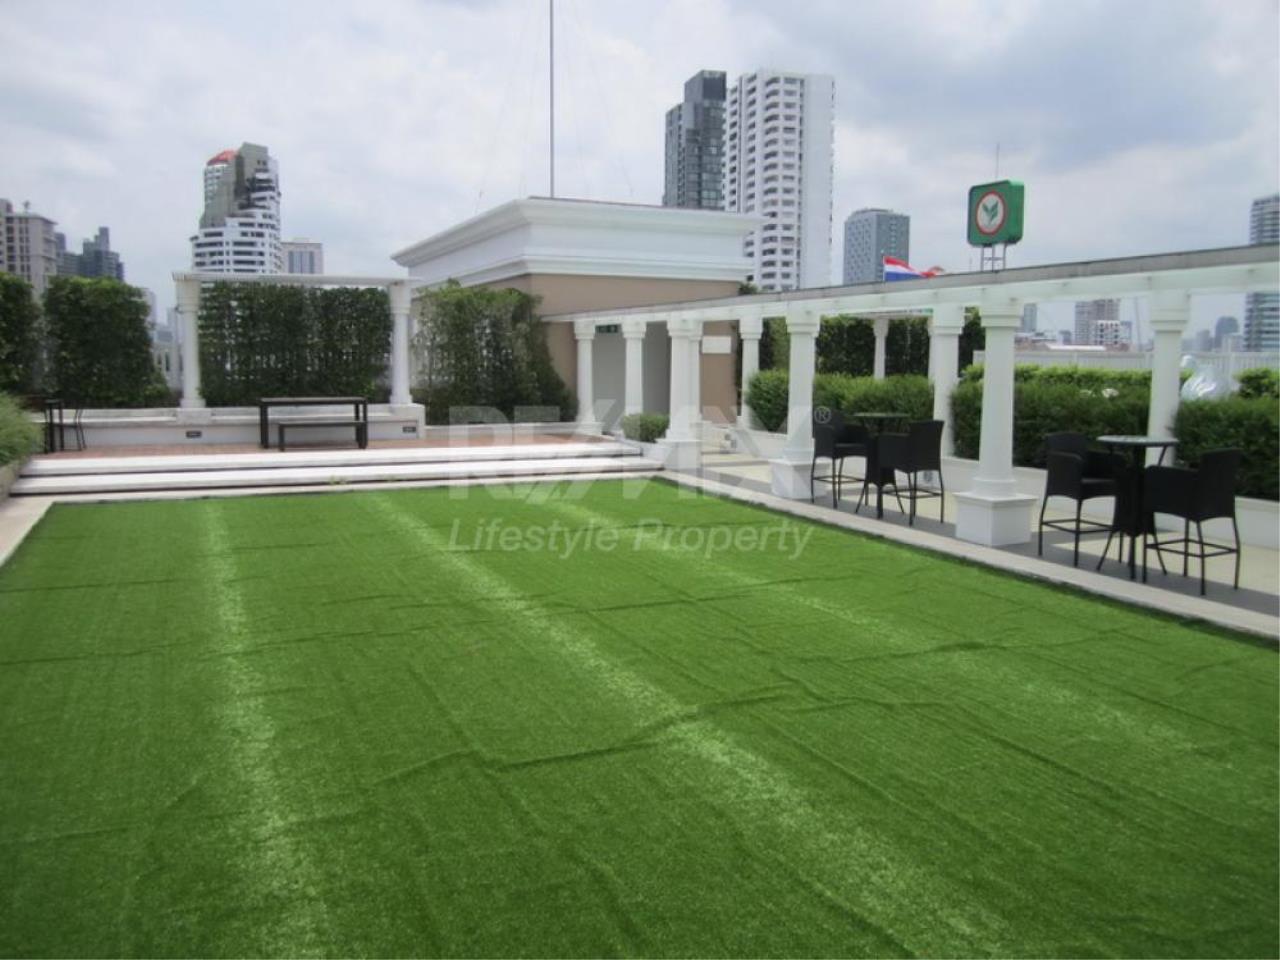 RE/MAX LifeStyle Property Agency's Le Nice Ekamai 4